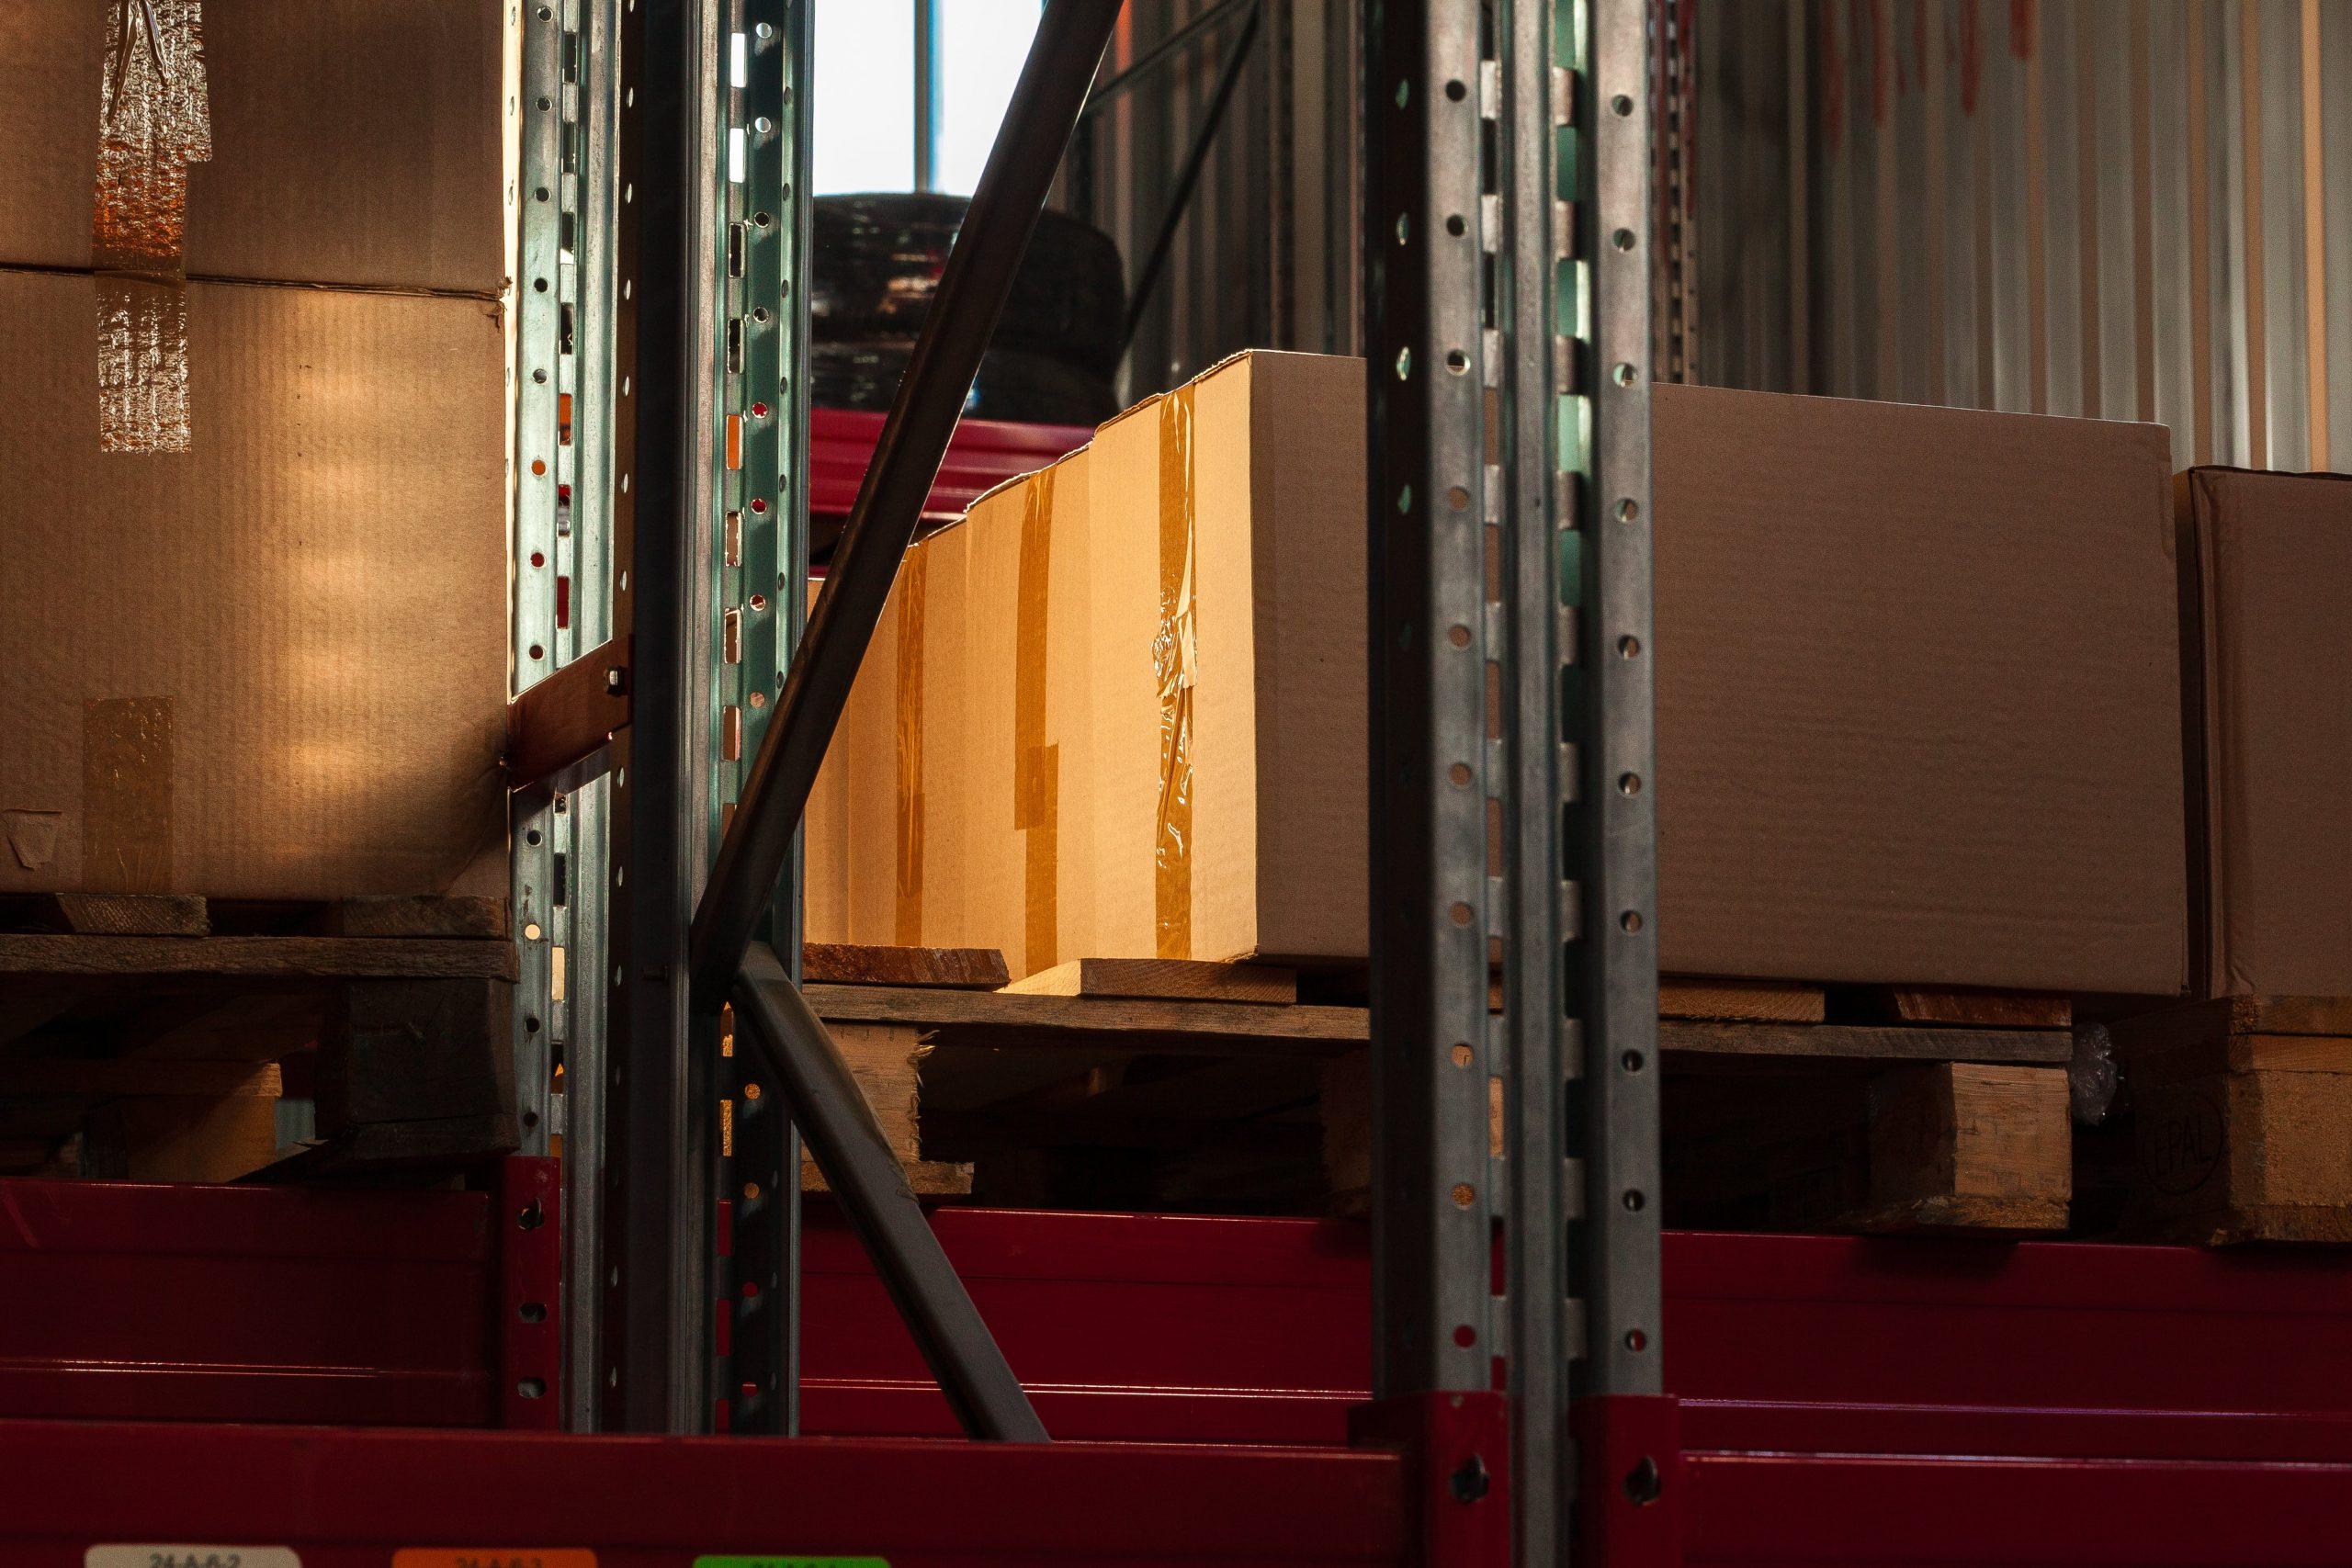 modern-warehouse-shelves-with-pile-of-cardboard-bo-YQ3THAA